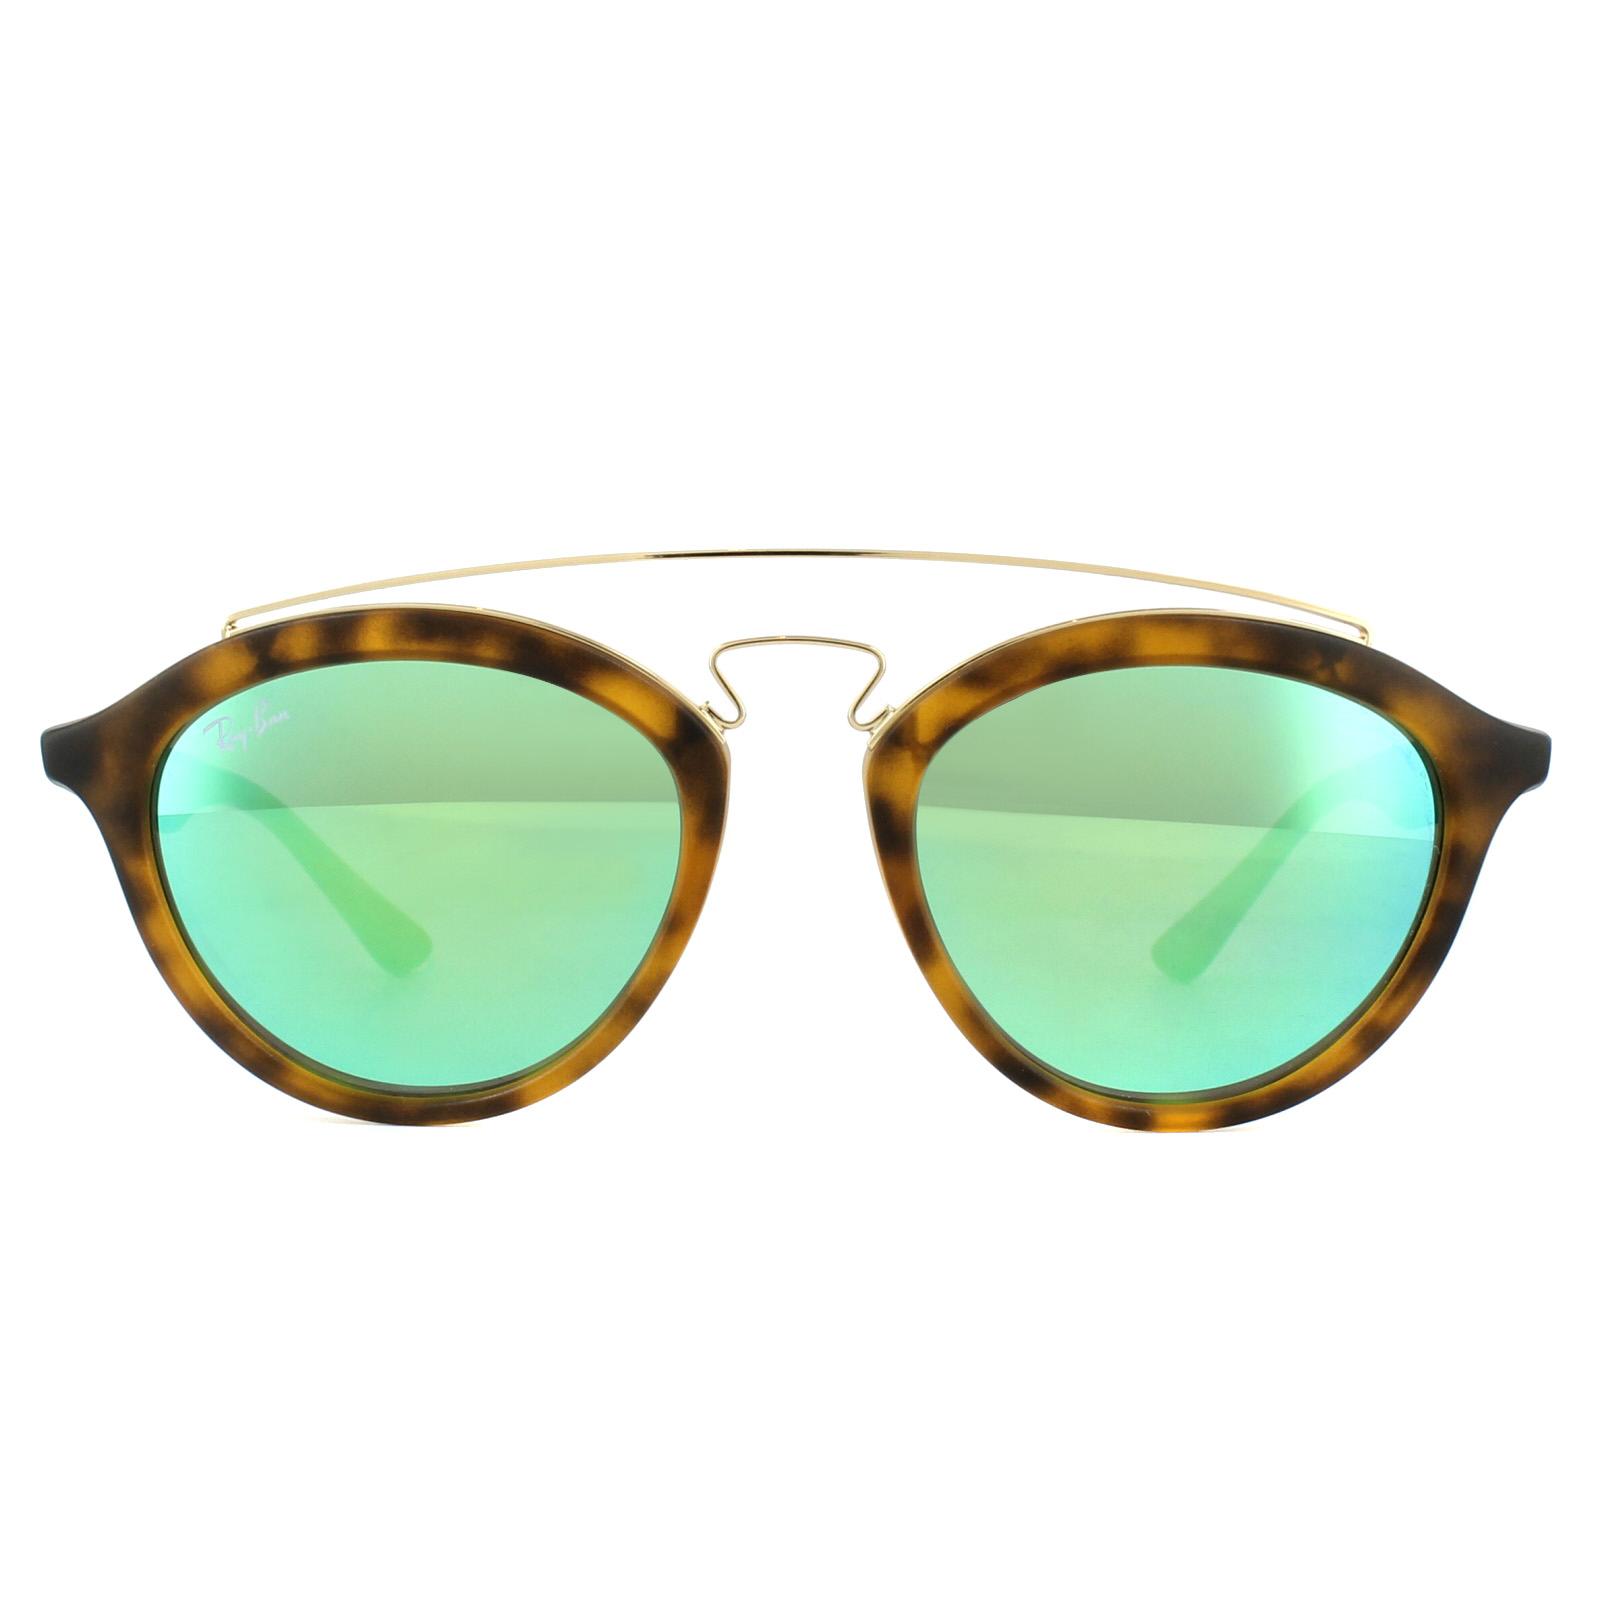 Shop Ray Ban RB 4257 60923R Gatsby II Matte Havana Plastic